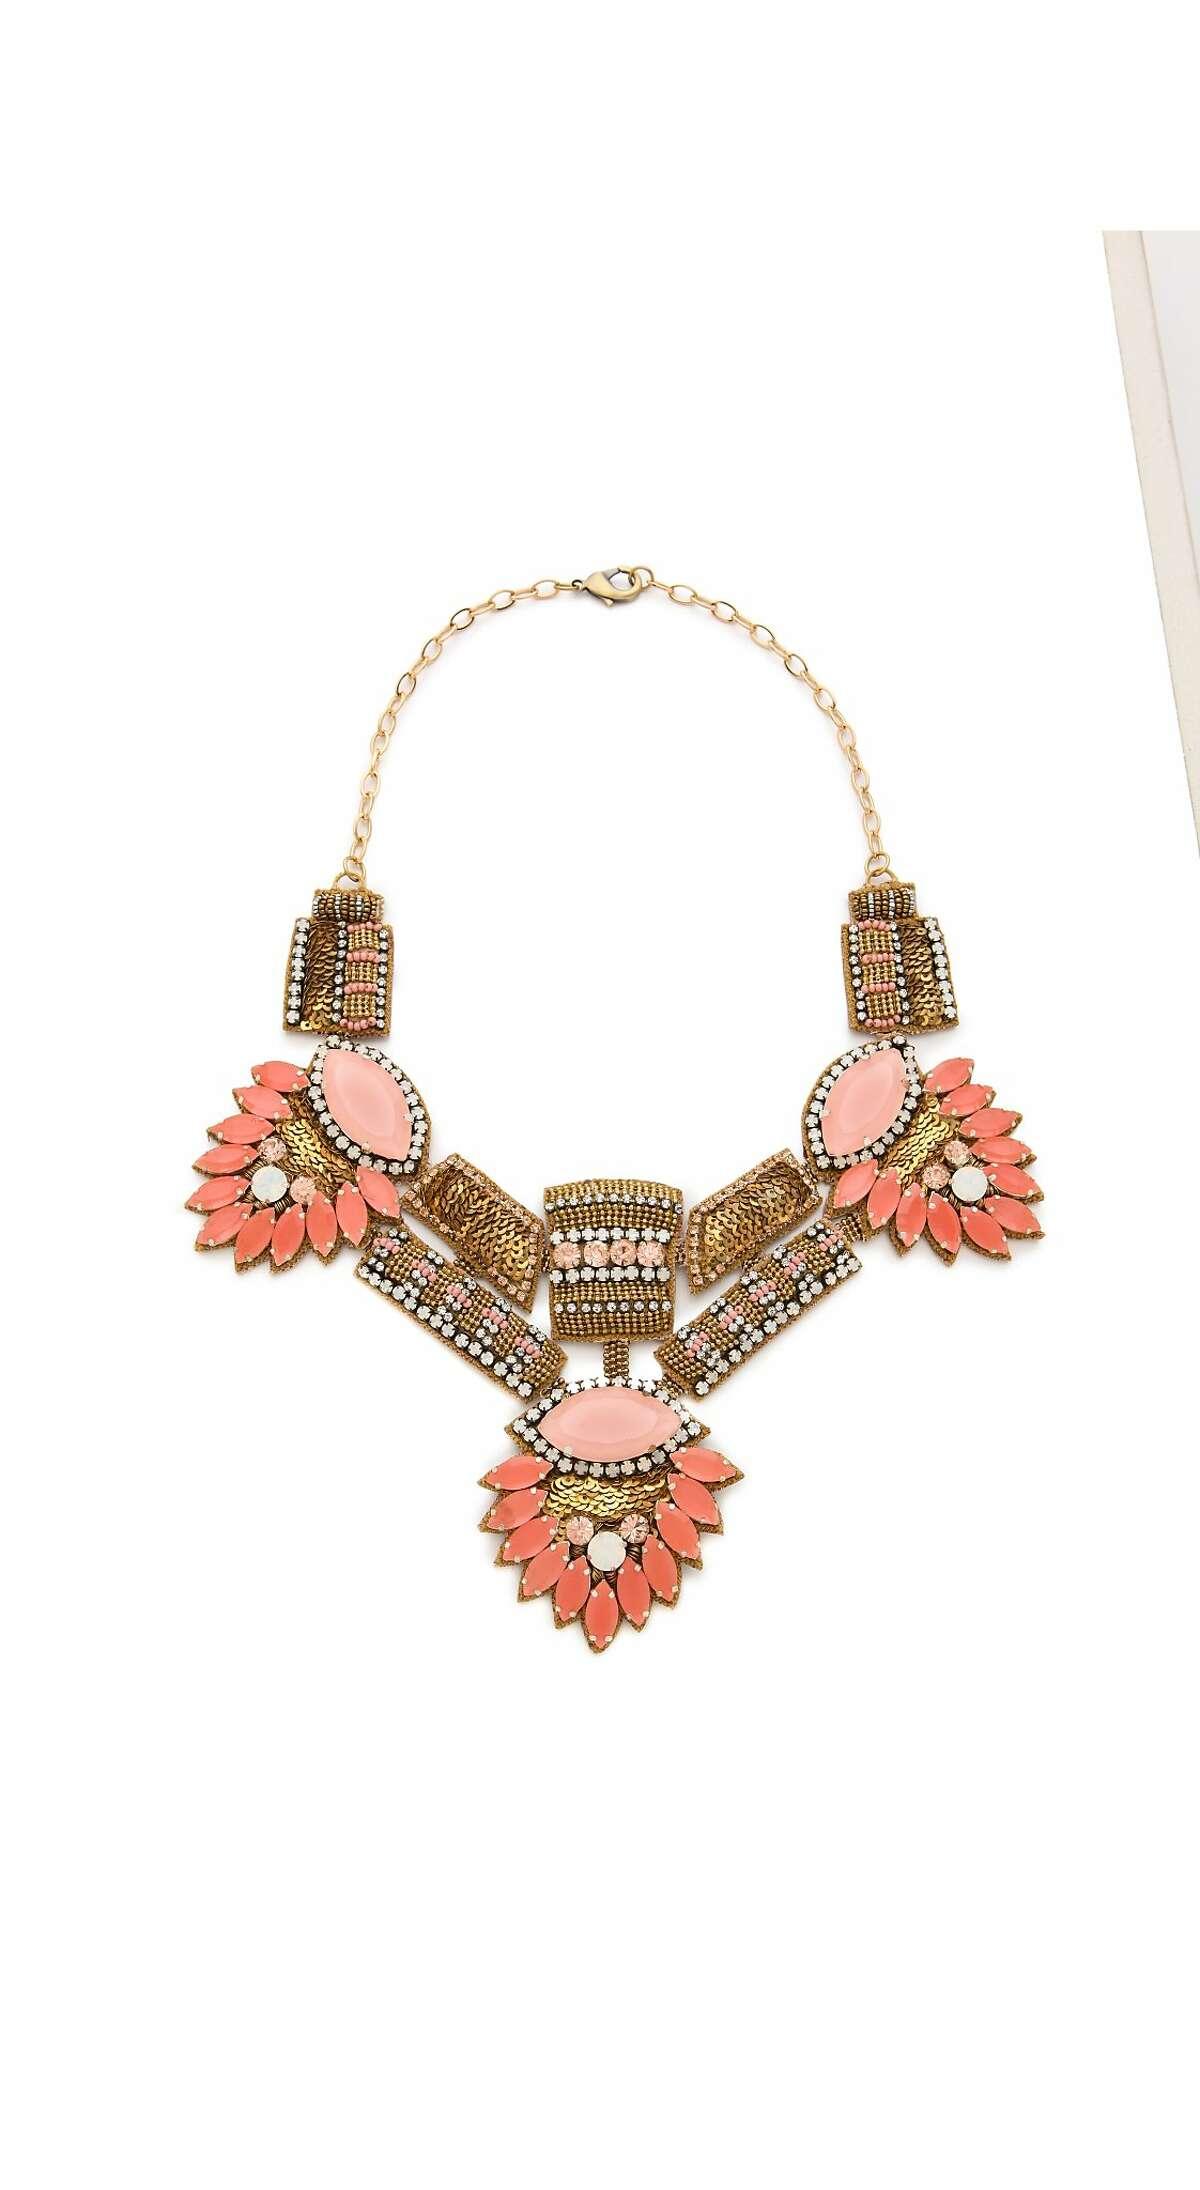 Deepa Gurnani stone statement necklace, $275, Shopbop.com